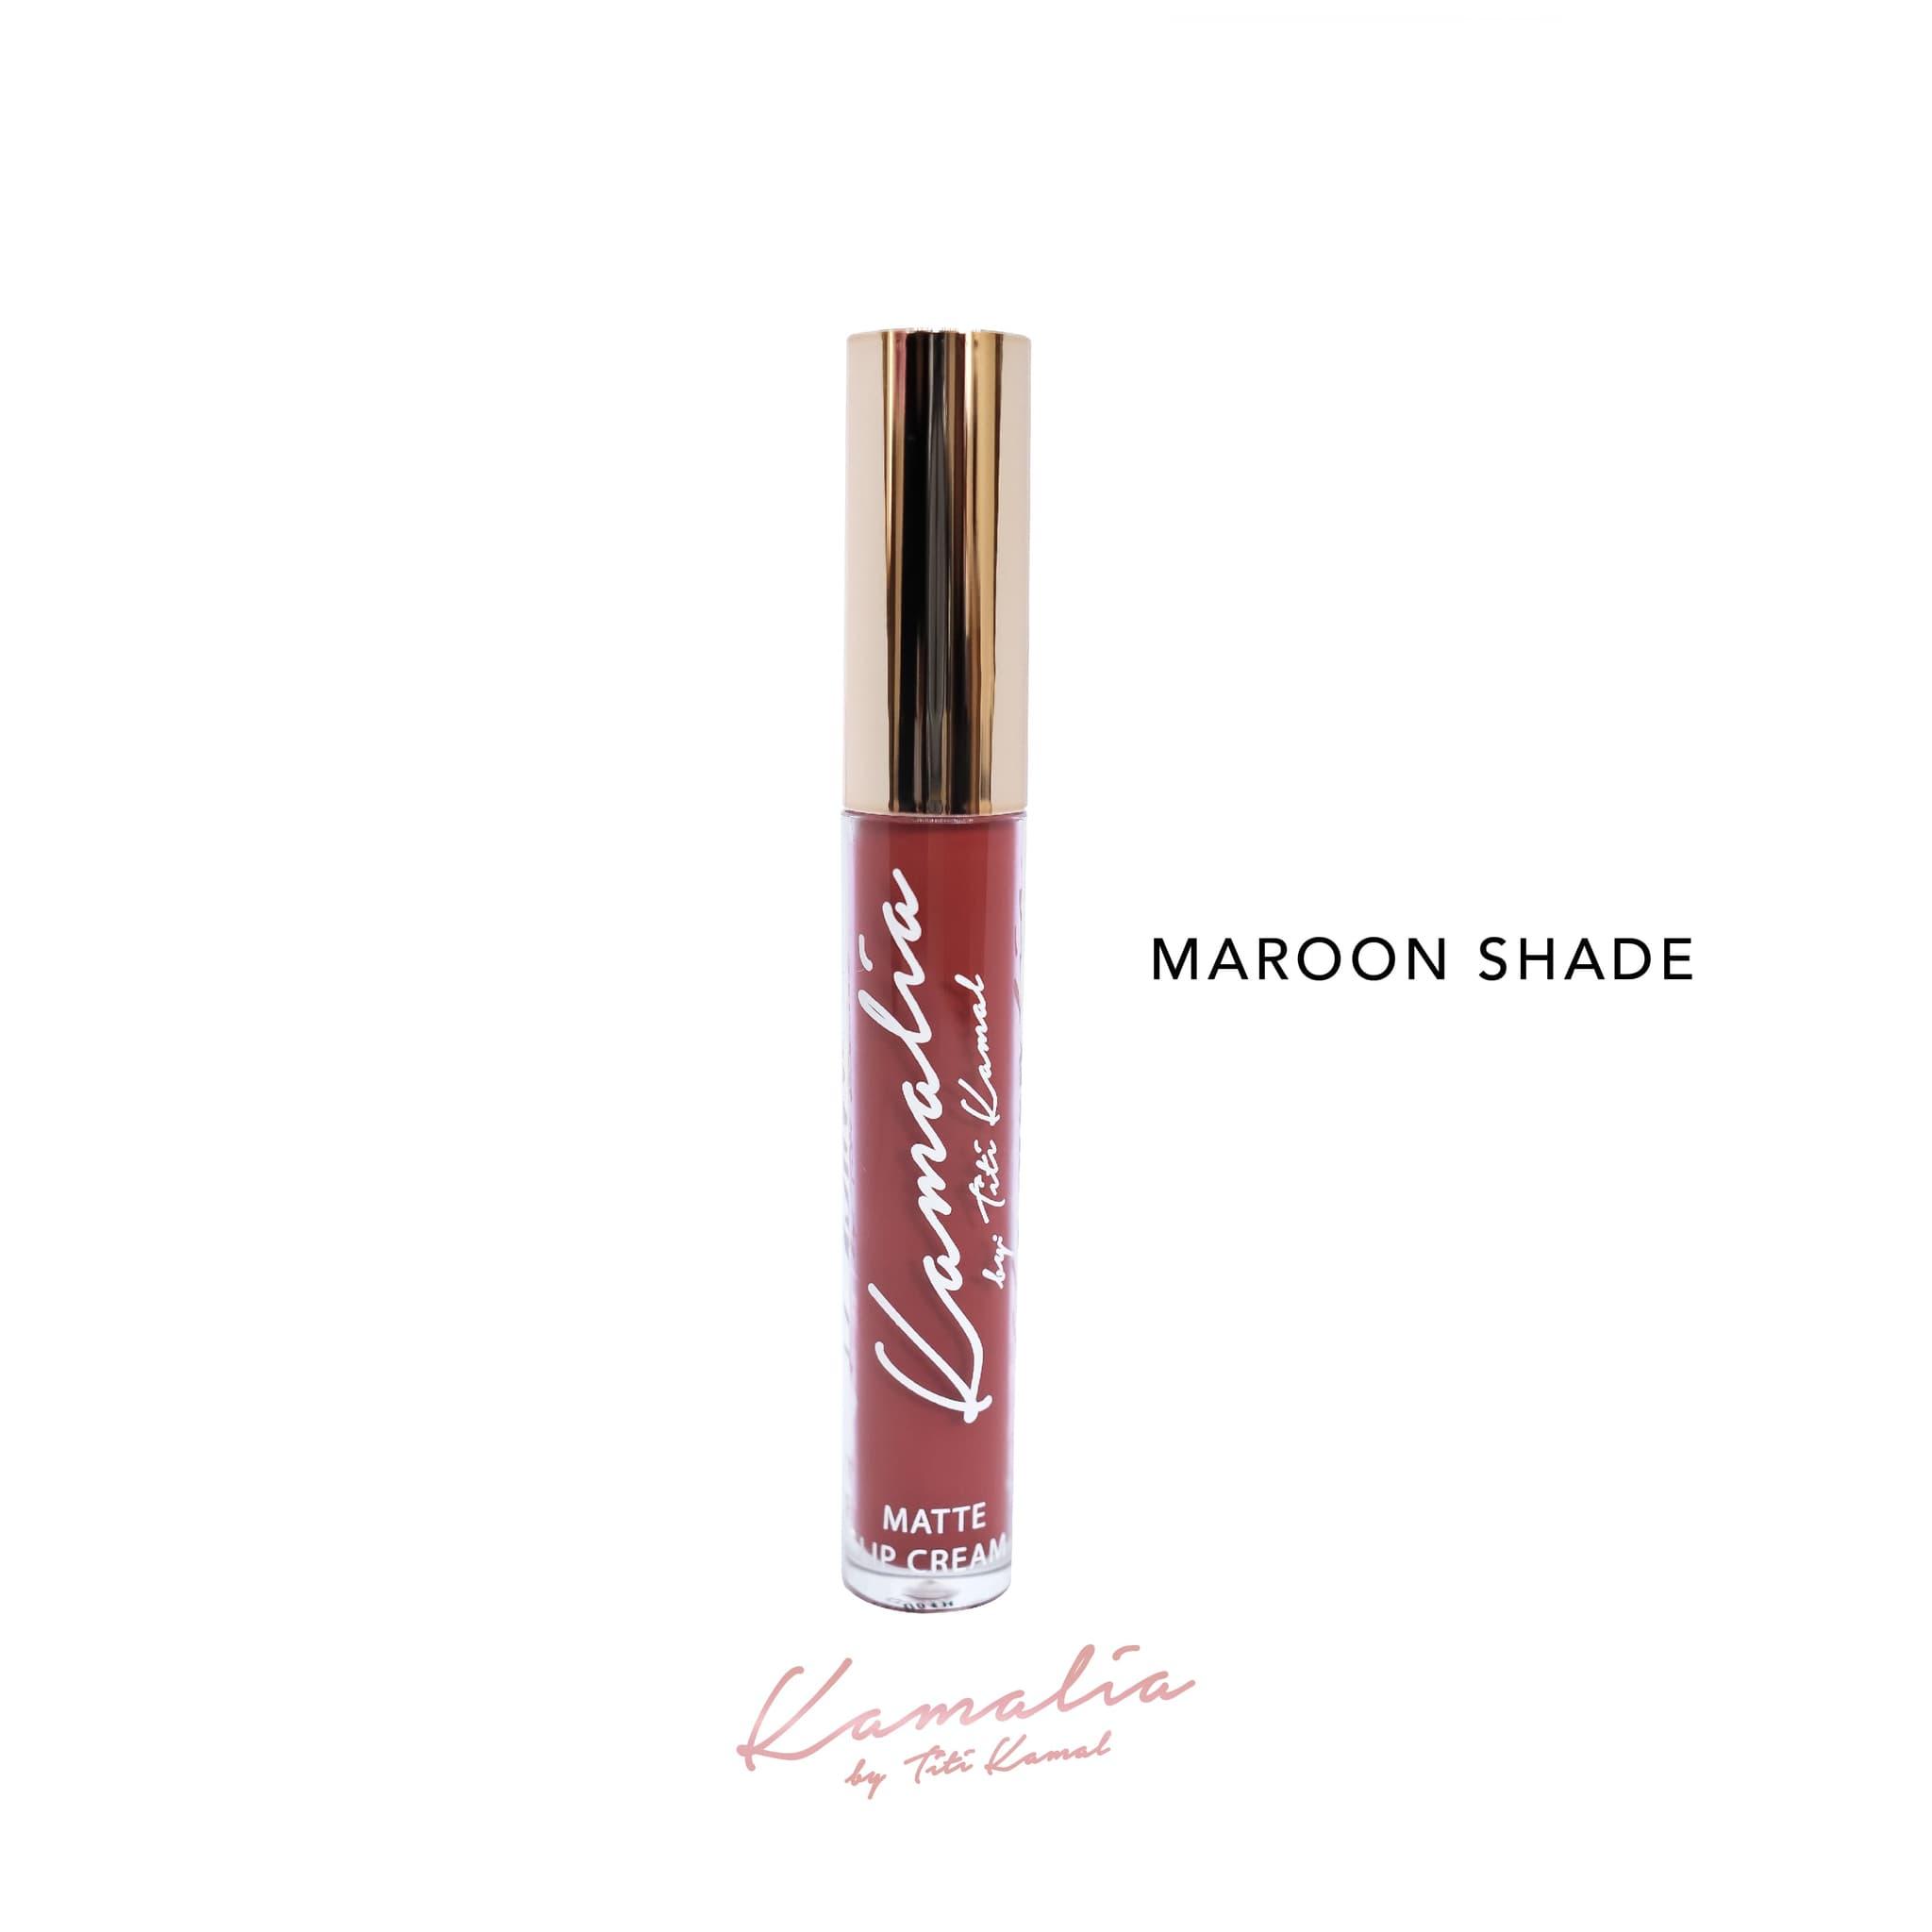 Maroon Shade Kamalia Lip Matte 4.2ml (Great Coverage, Last All Day) thumbnail